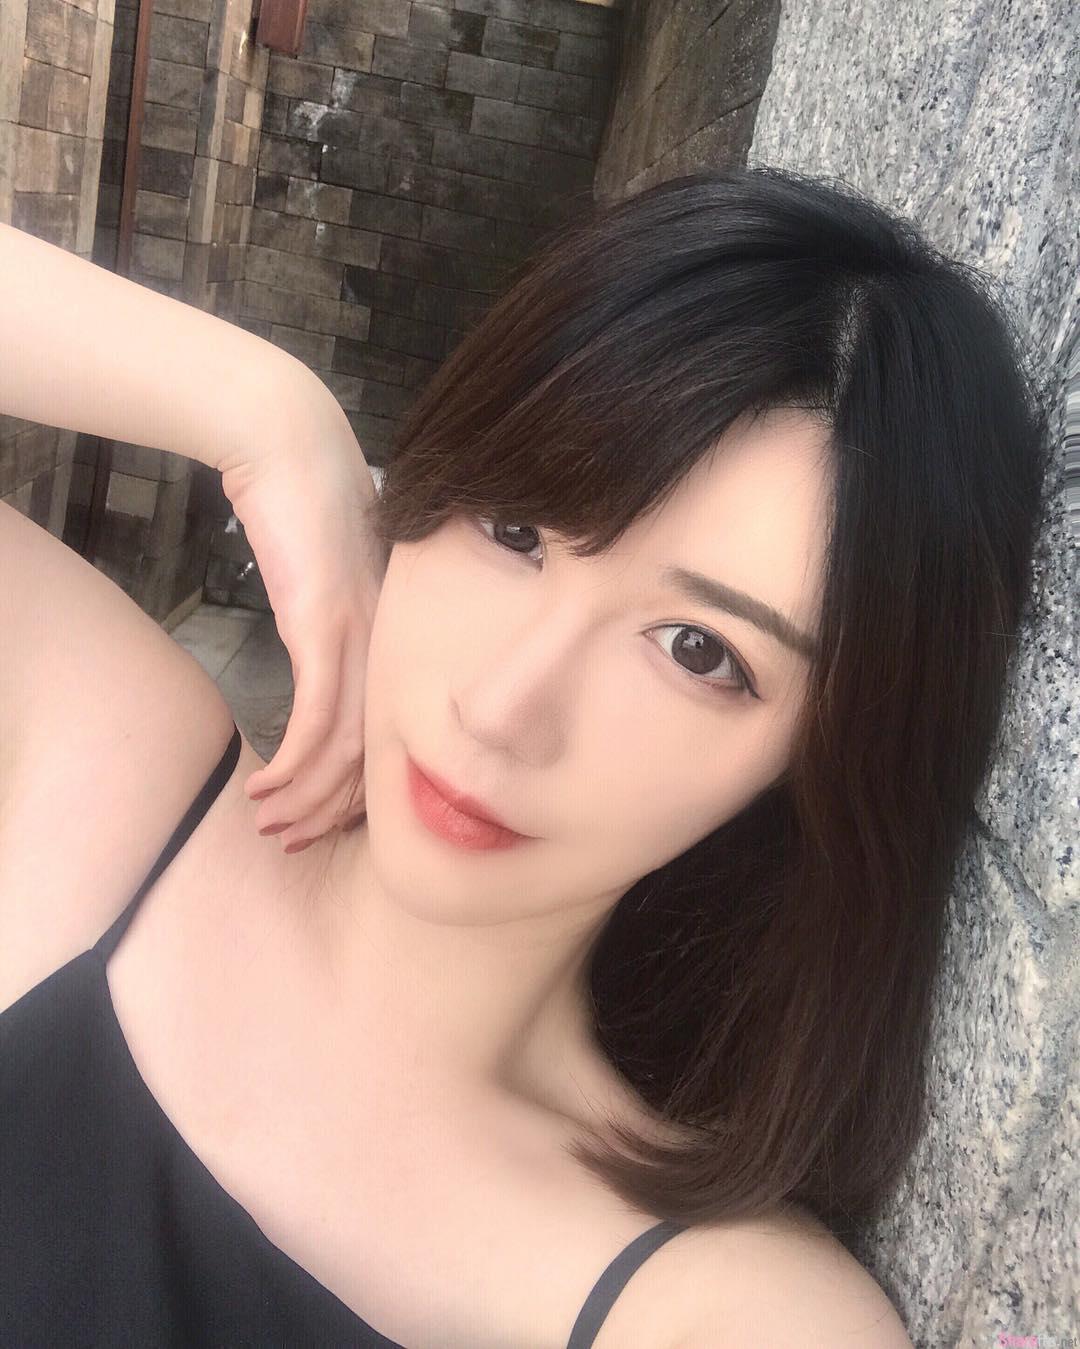 上海正妹Sharon,白皙迷人